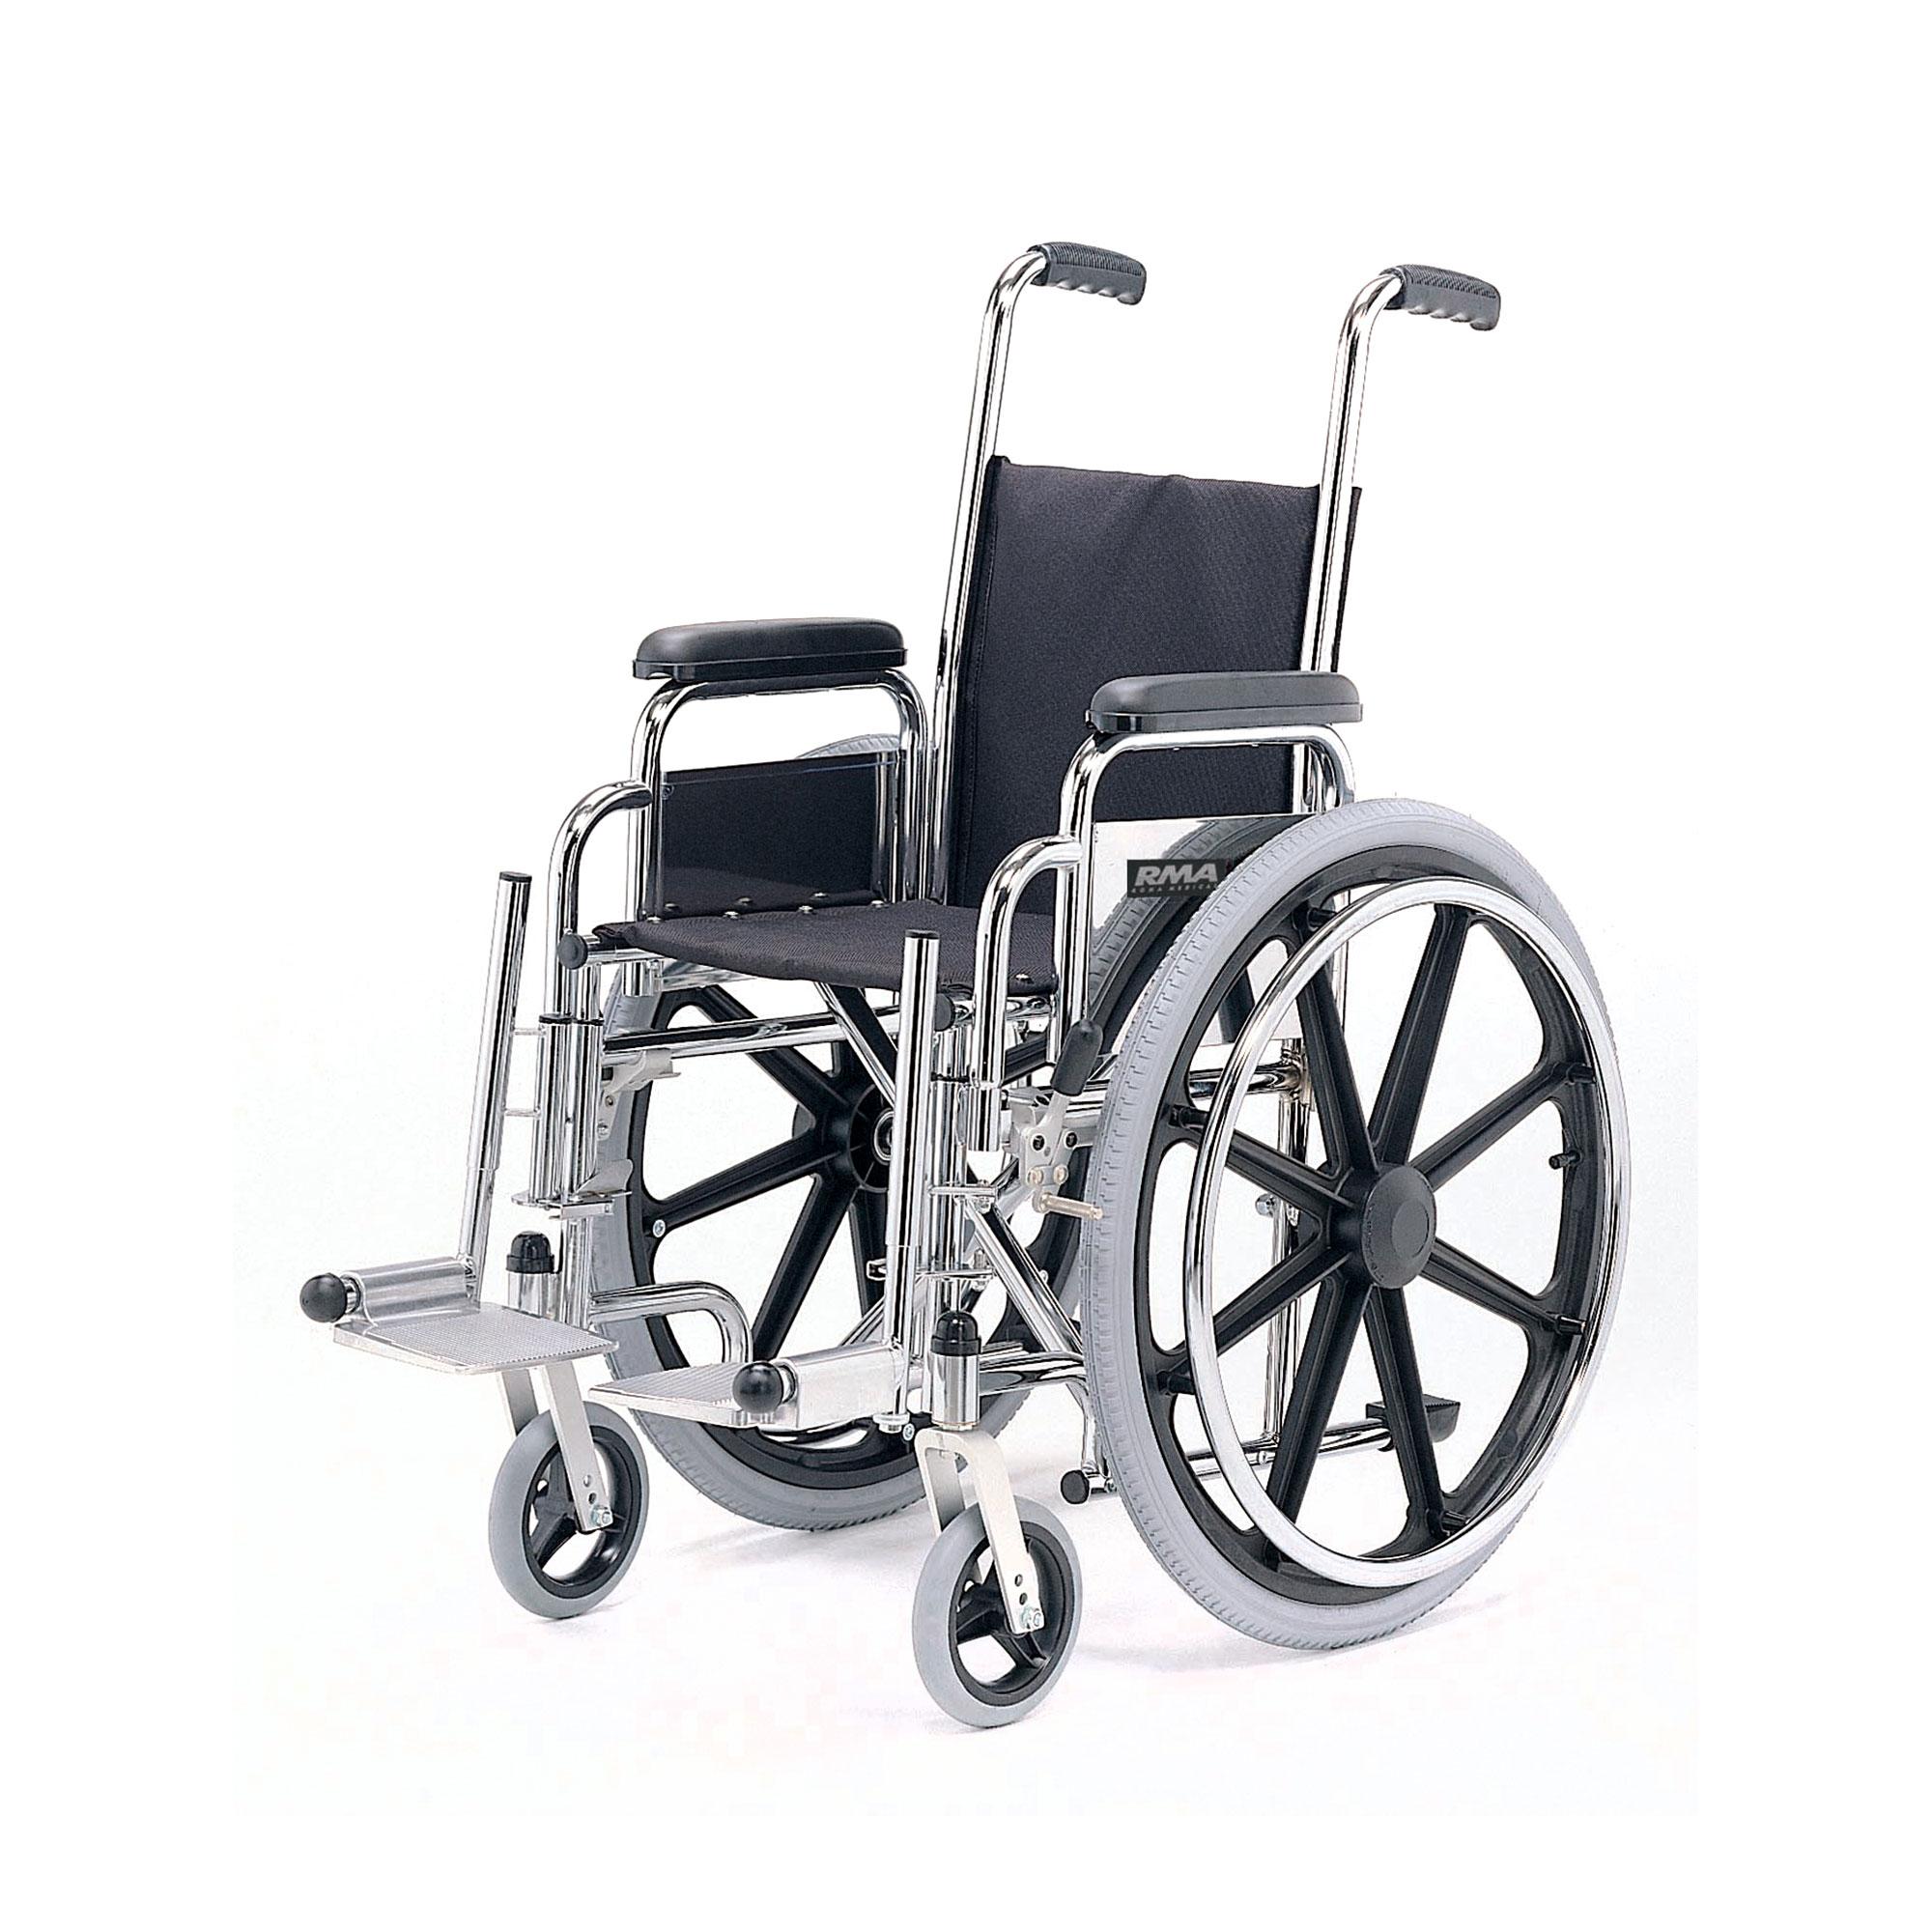 1451 Paediatric Self Propelling Wheelchair Roma Medical